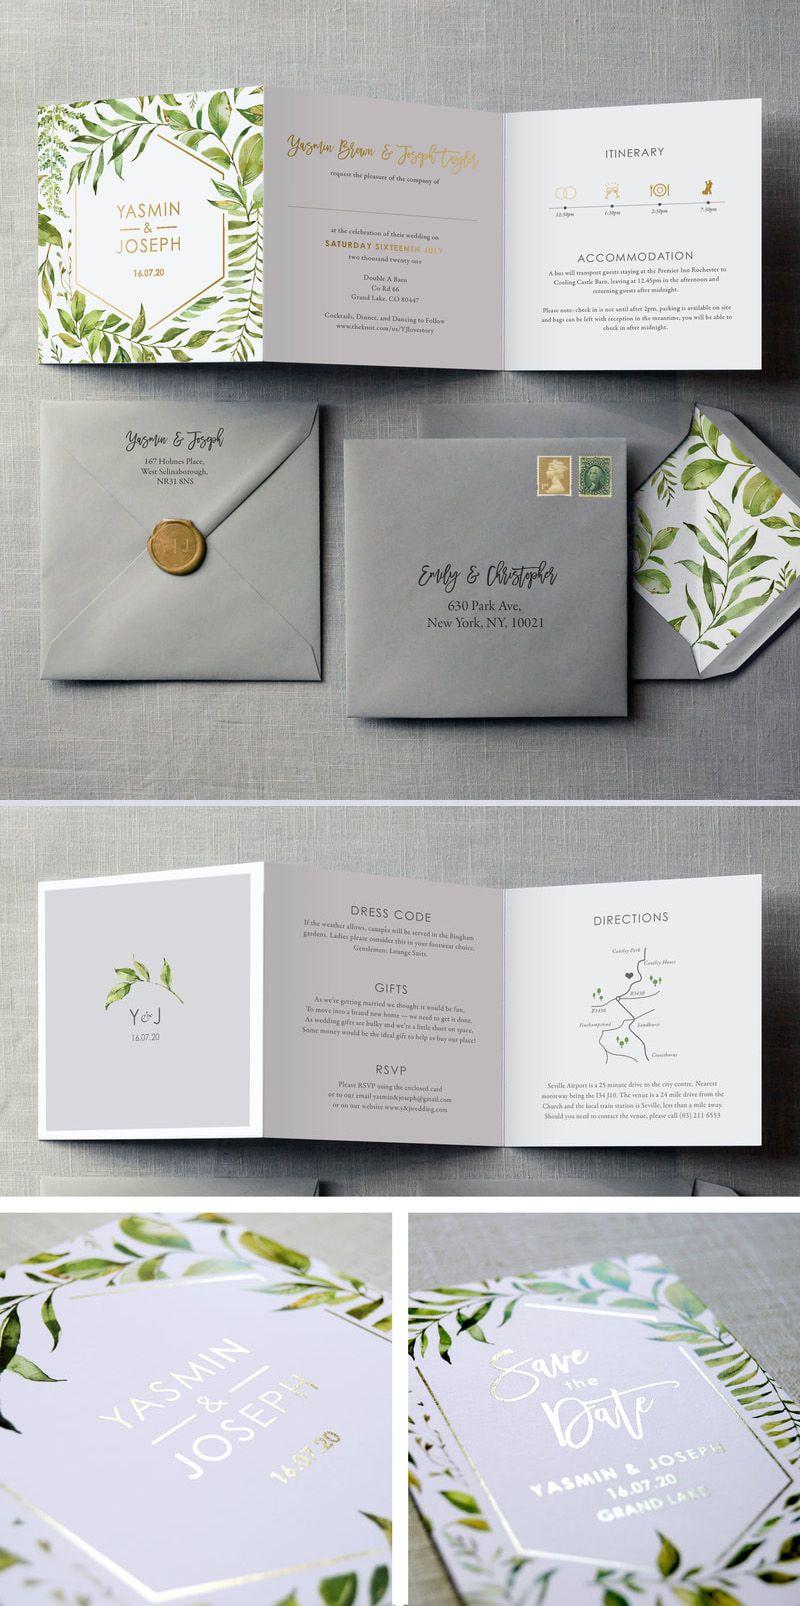 Tuscany Wedding Invitation Greenery and Gold, Save the